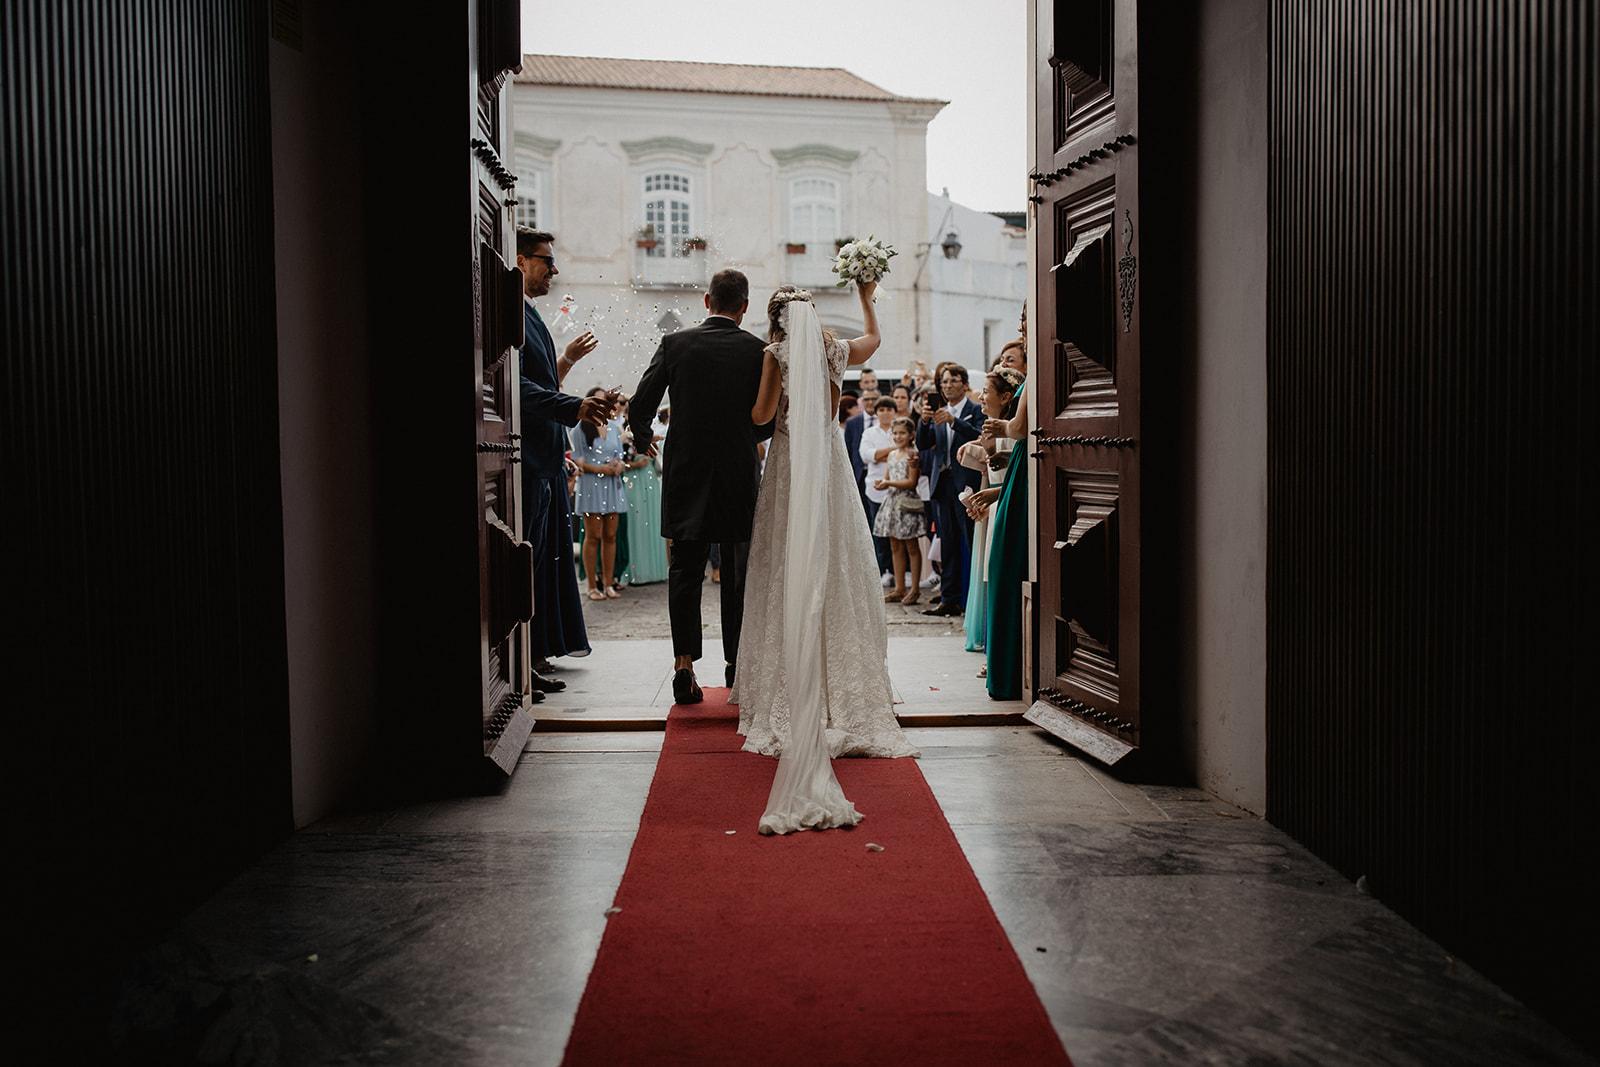 Lapela-photography-wedding-algarve-portugal-best-of-135.jpg